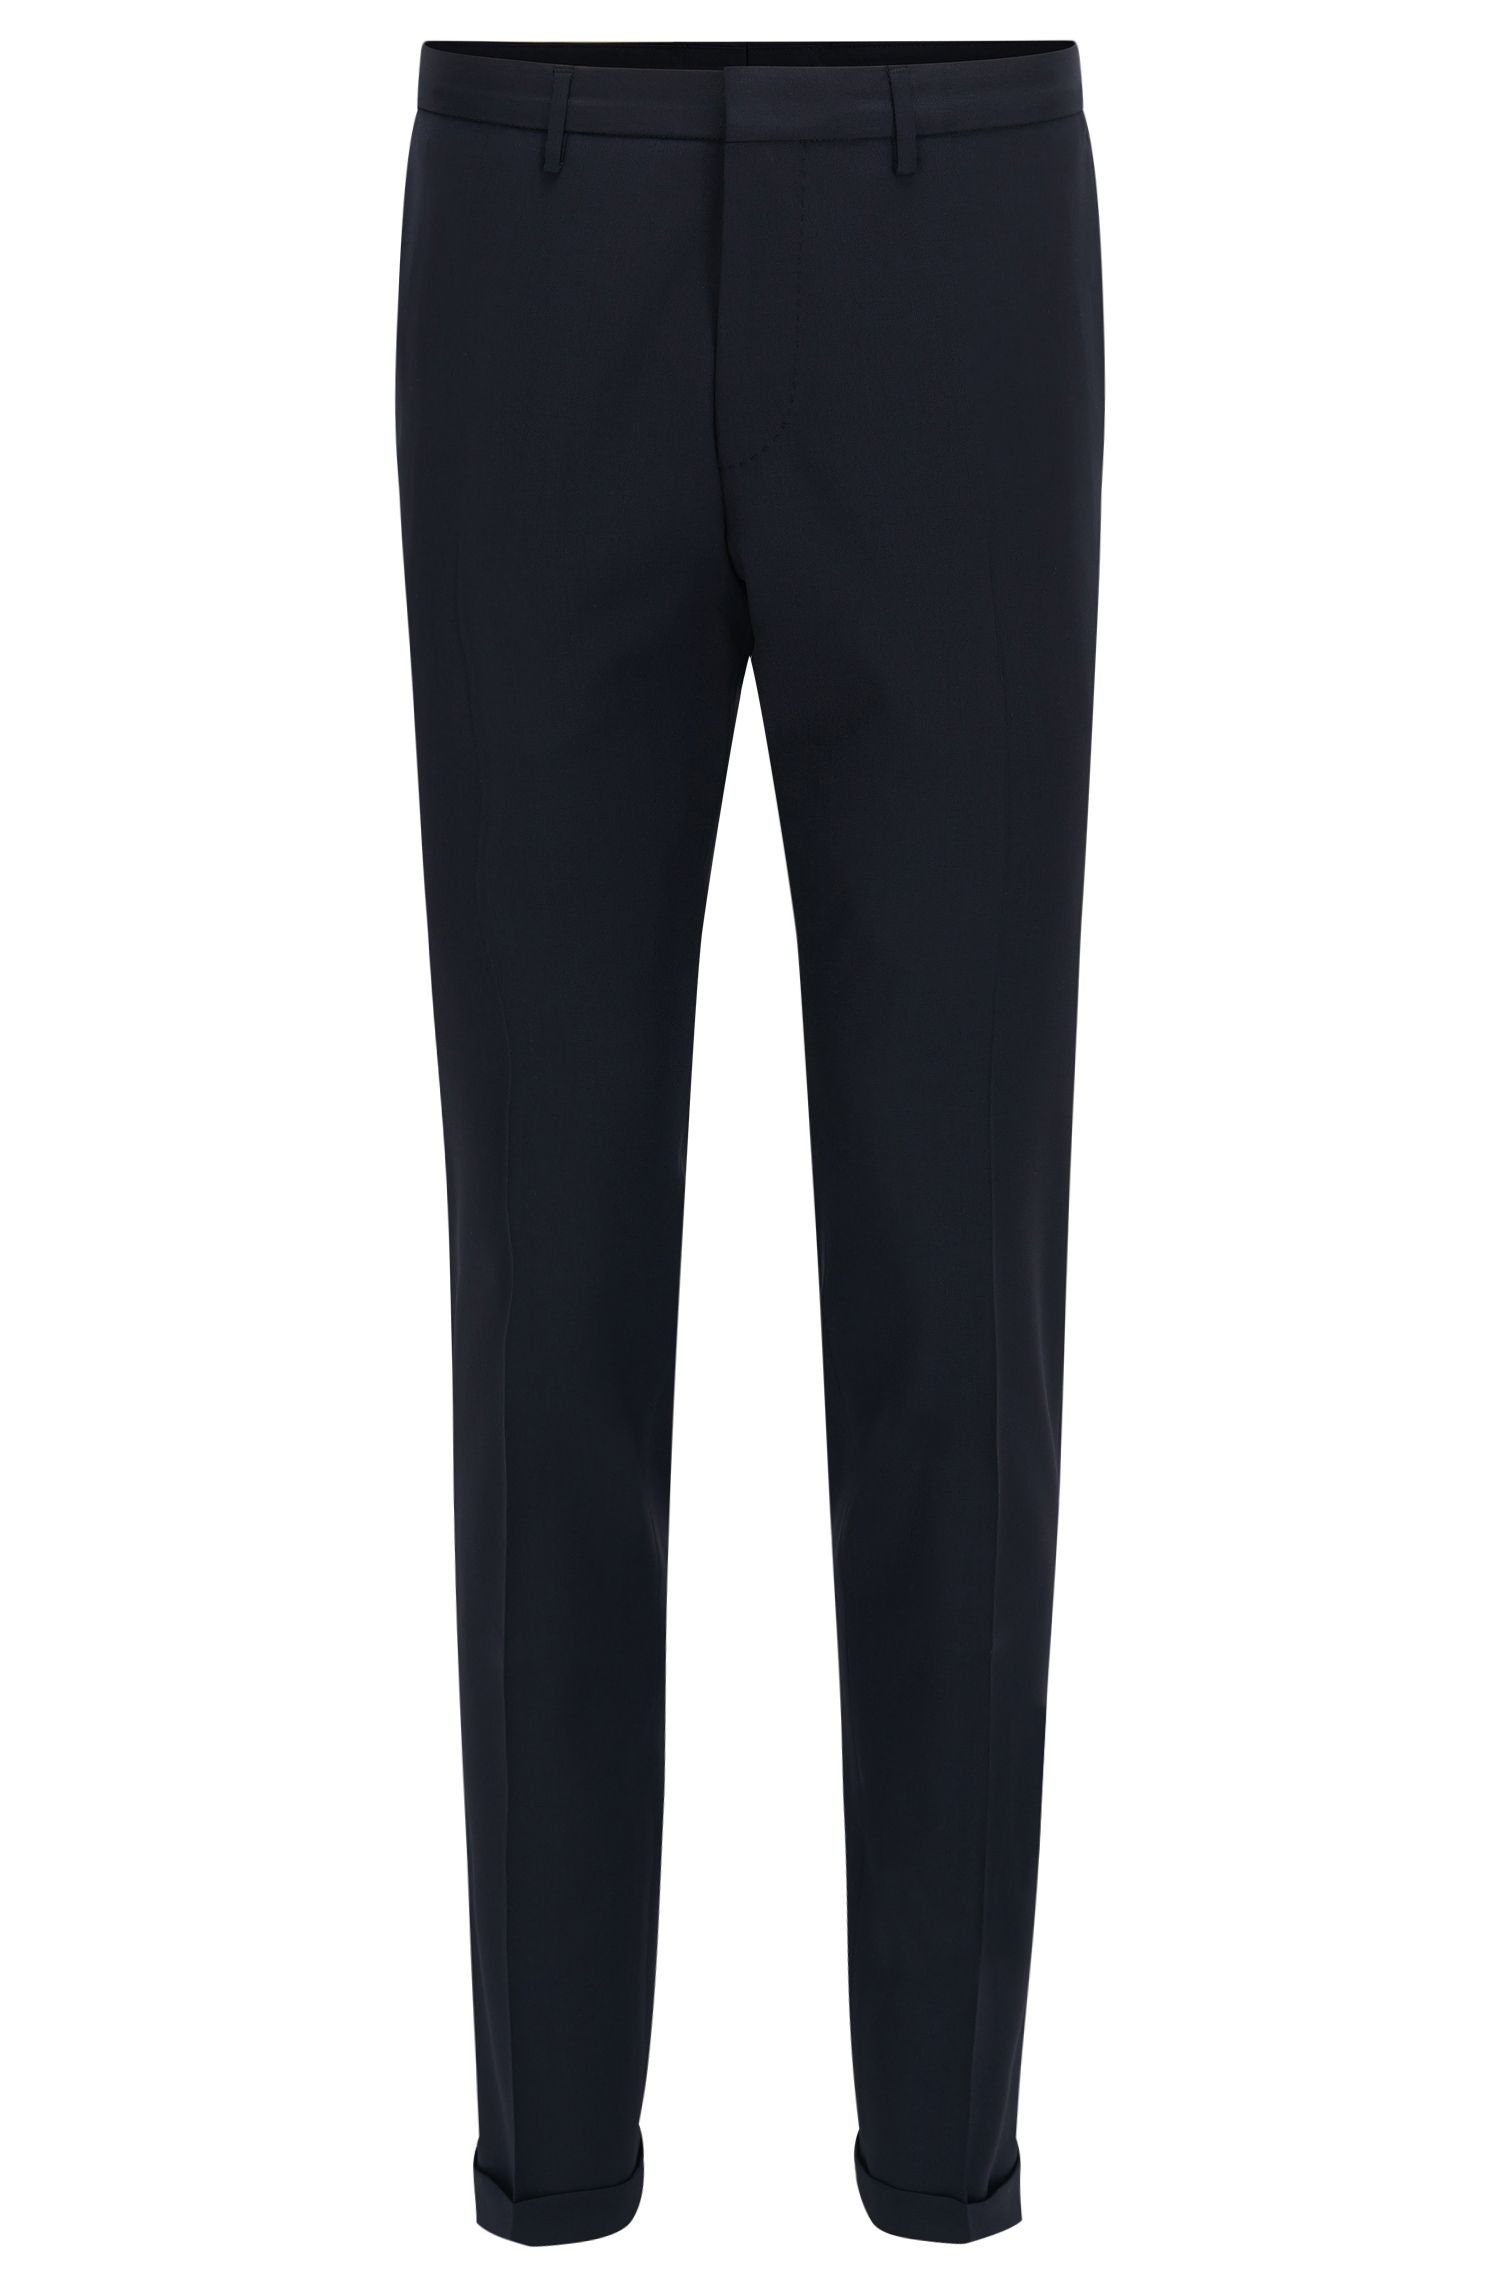 Pantalón extra slim fit en lana virgen, Azul oscuro